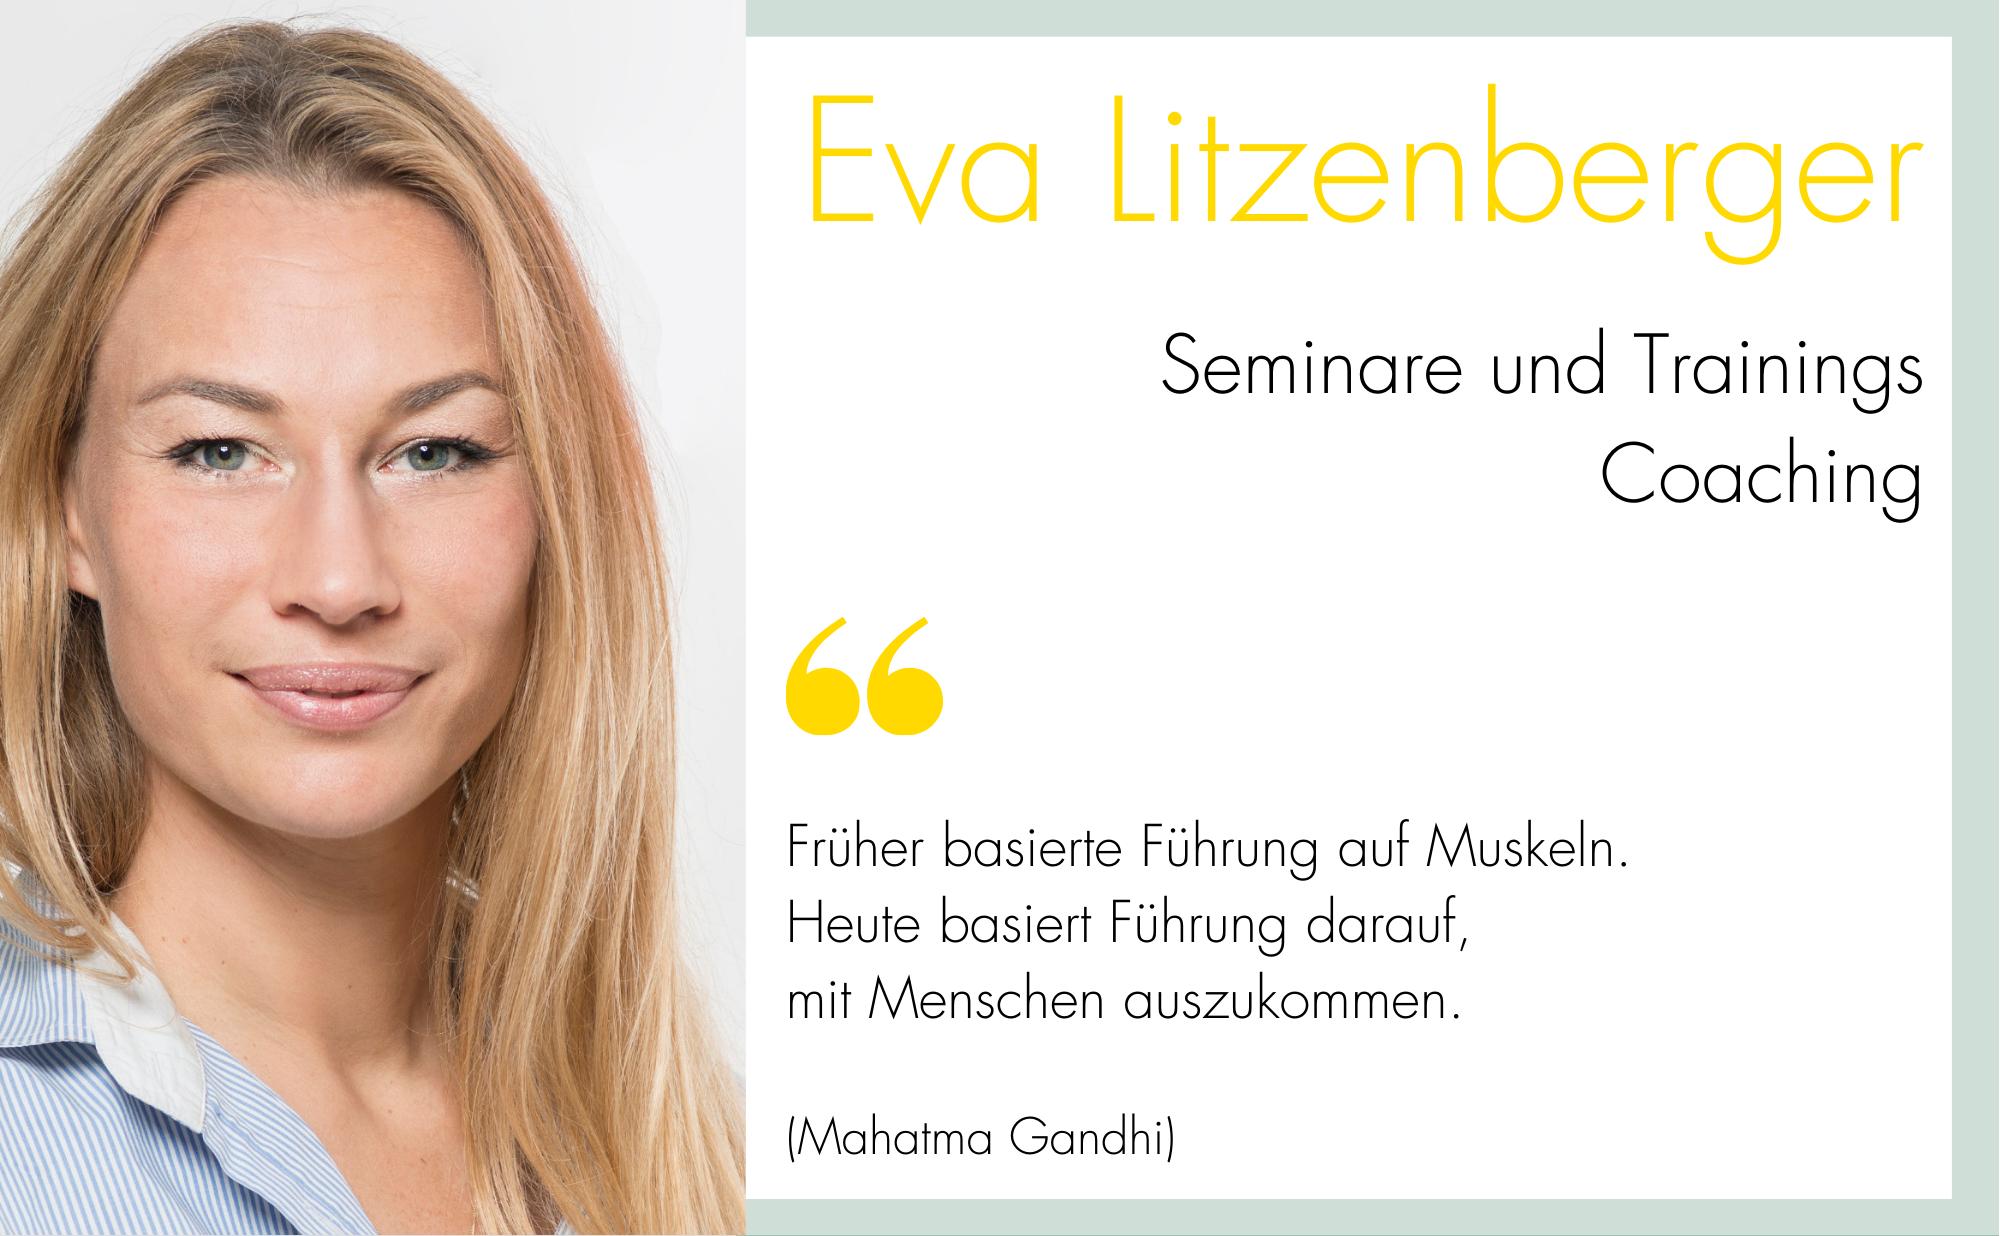 Eva Litzenberger